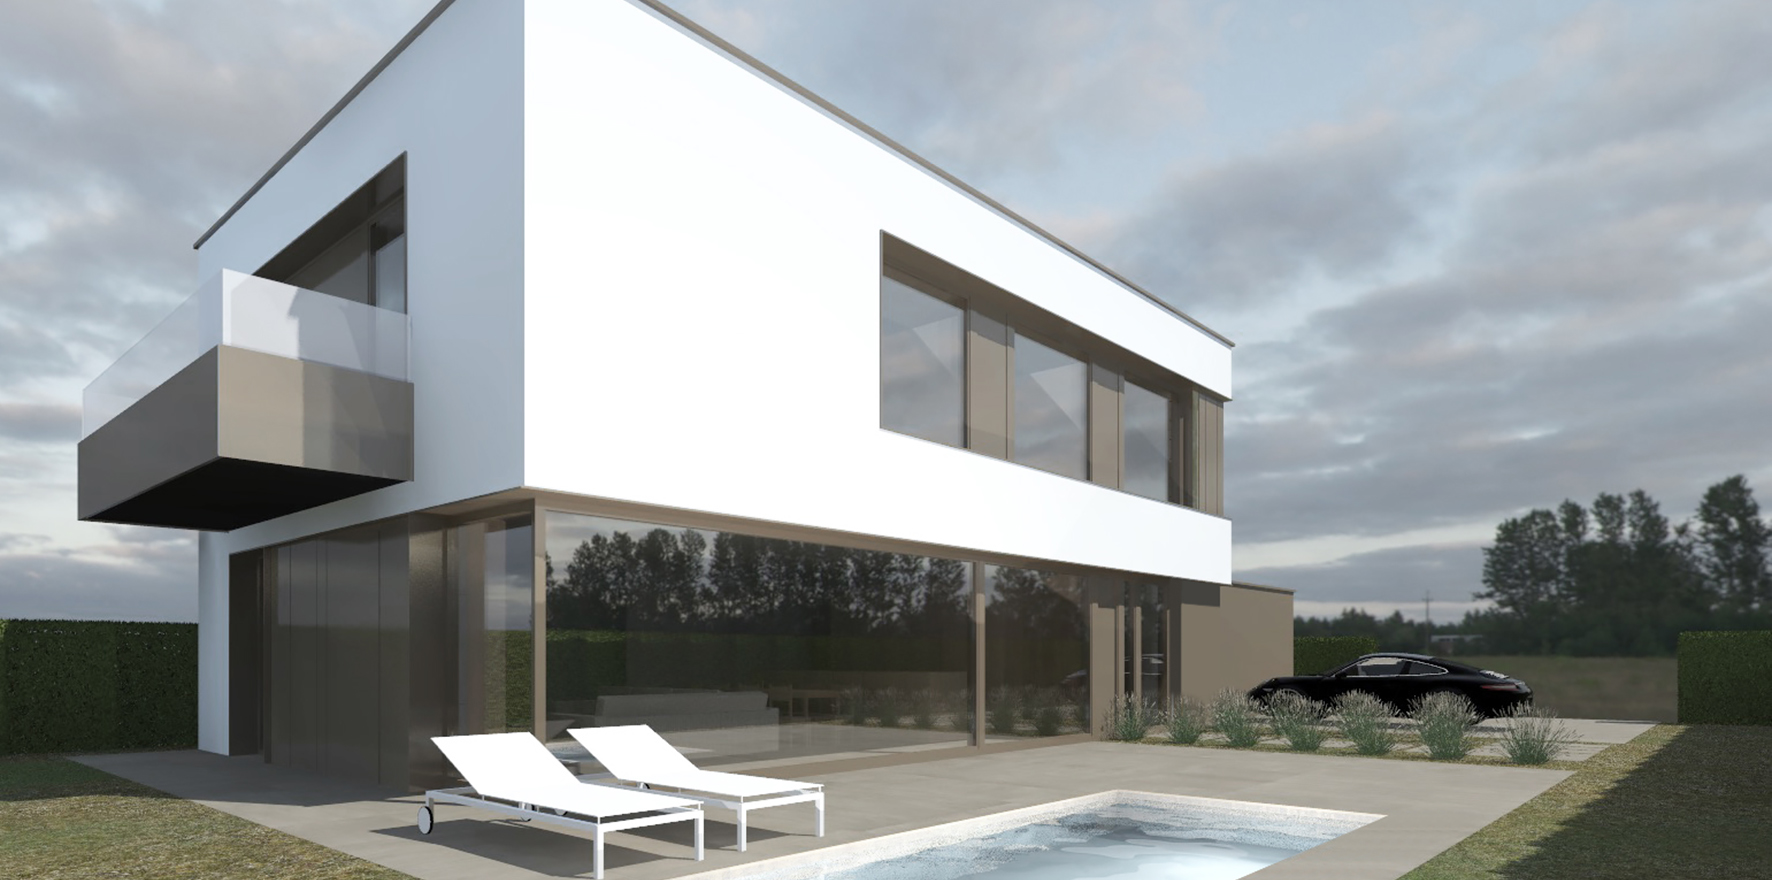 145-maison-kehlen-cfa-cfarchitectes-architecte-luxembourg-luxe-a